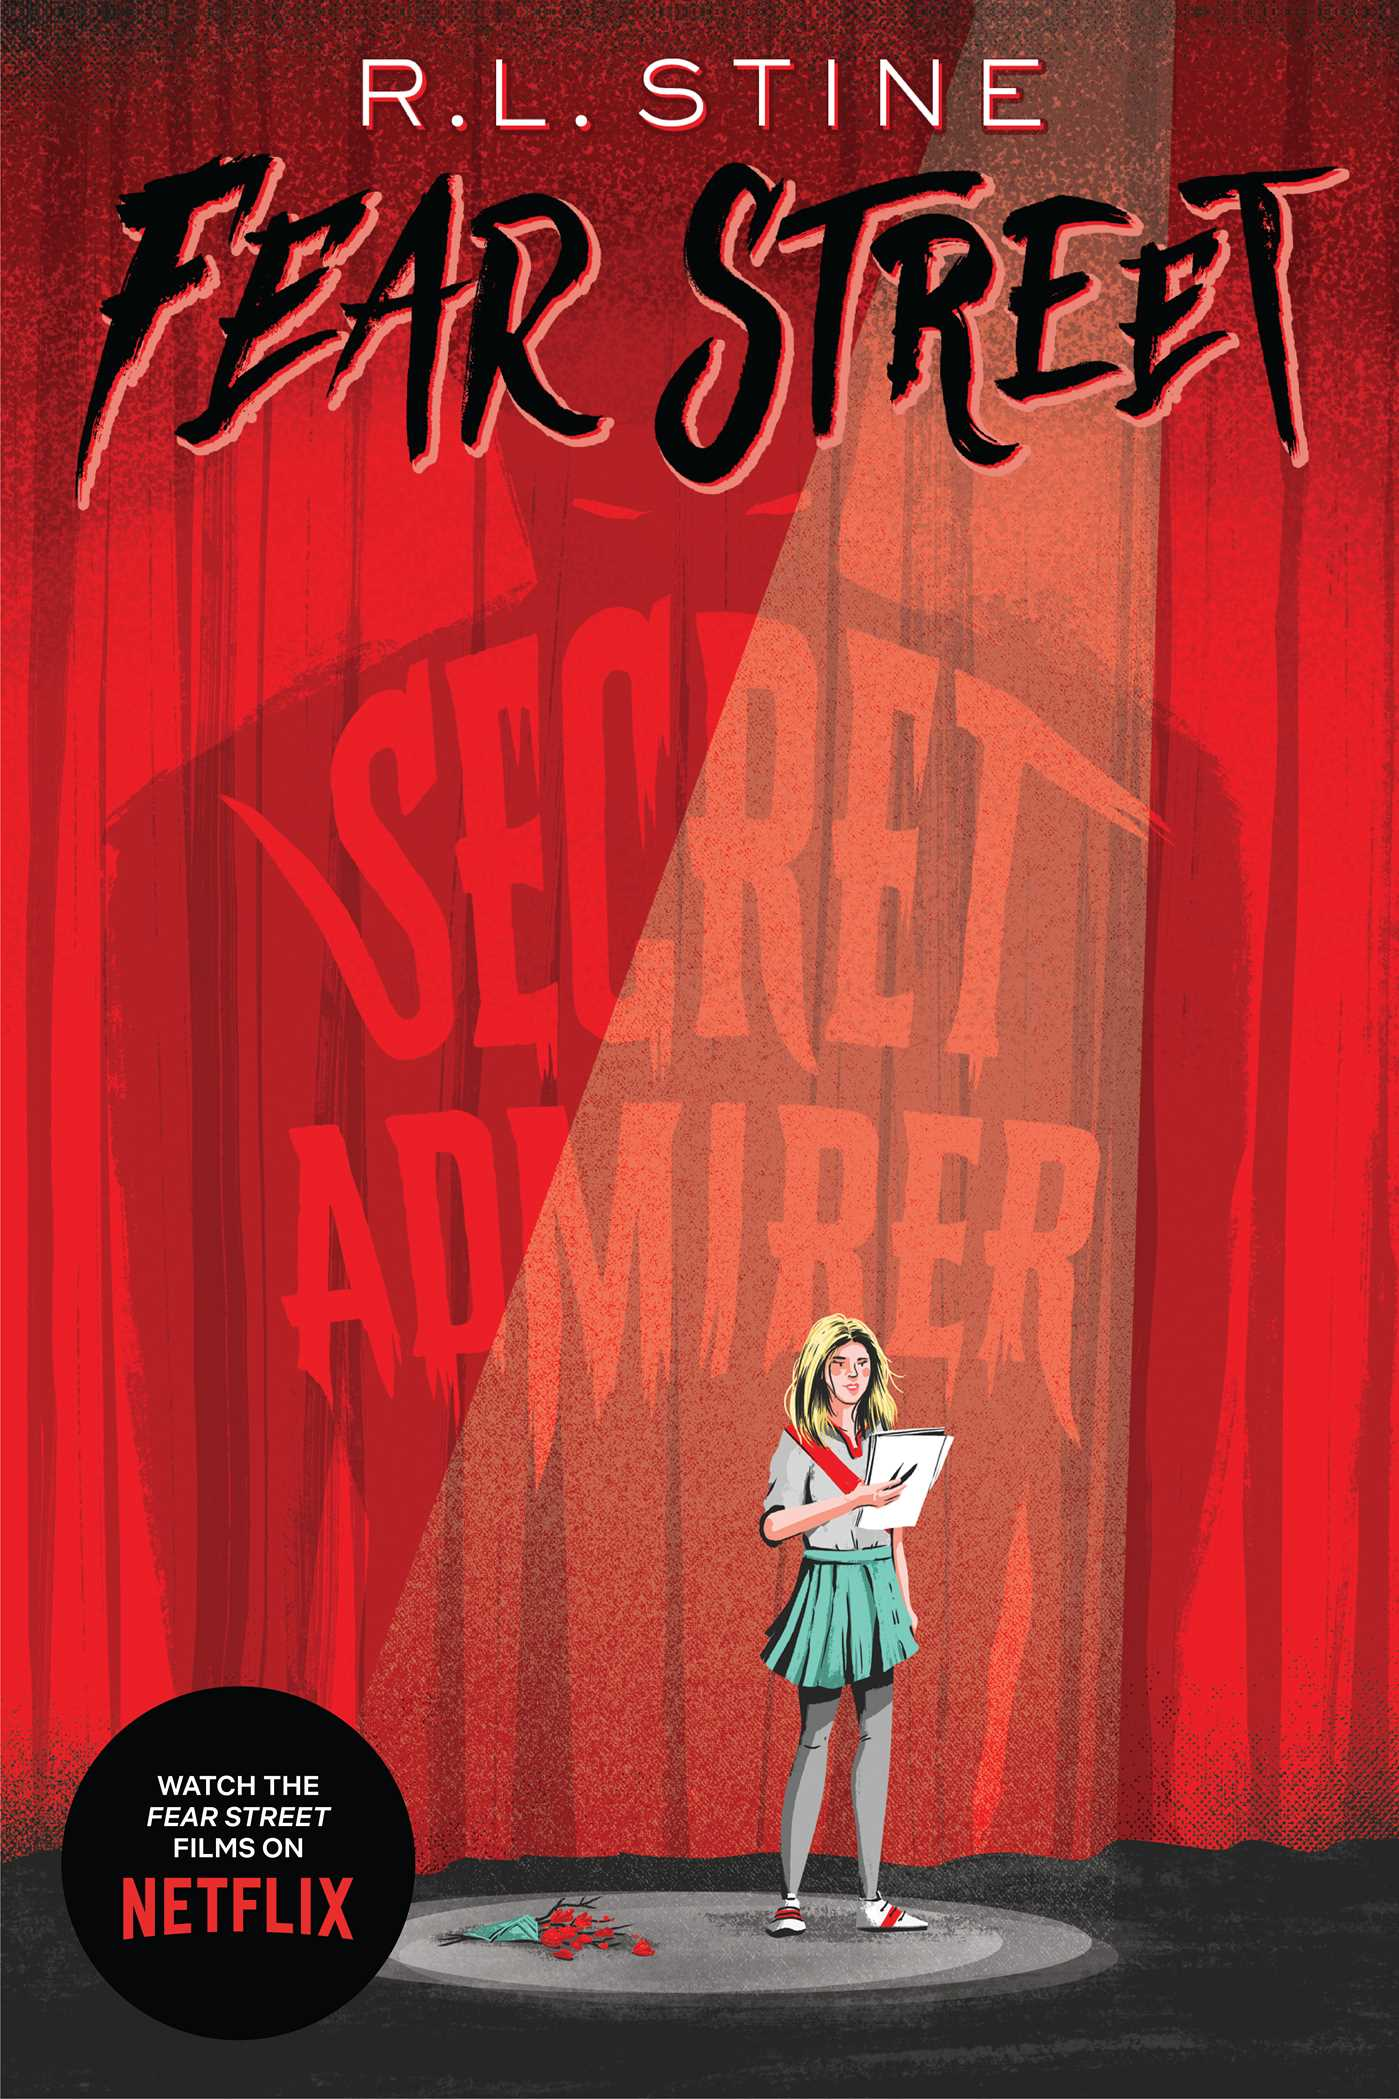 Secret admirer 9781439115527 hr